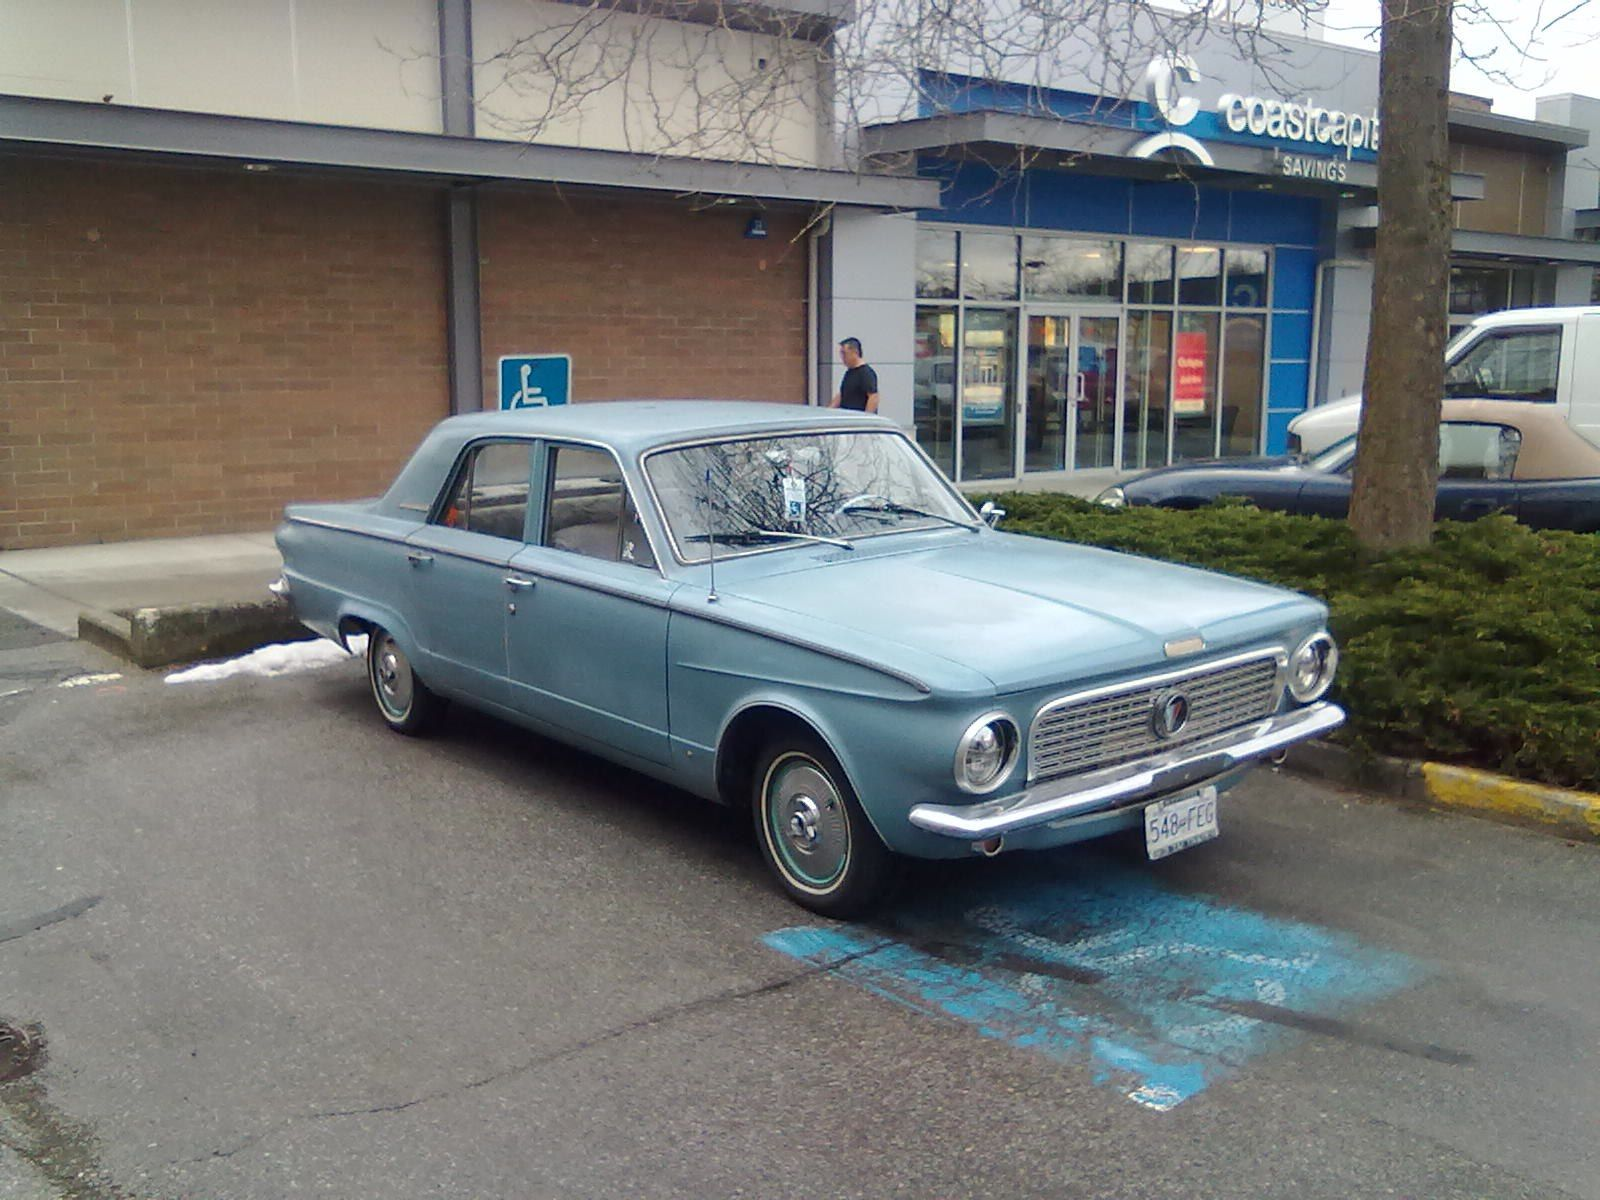 1963 valiant 1963 plymouth valiant 1024 x 770 1963 plymouth valiant 1280 x 1080